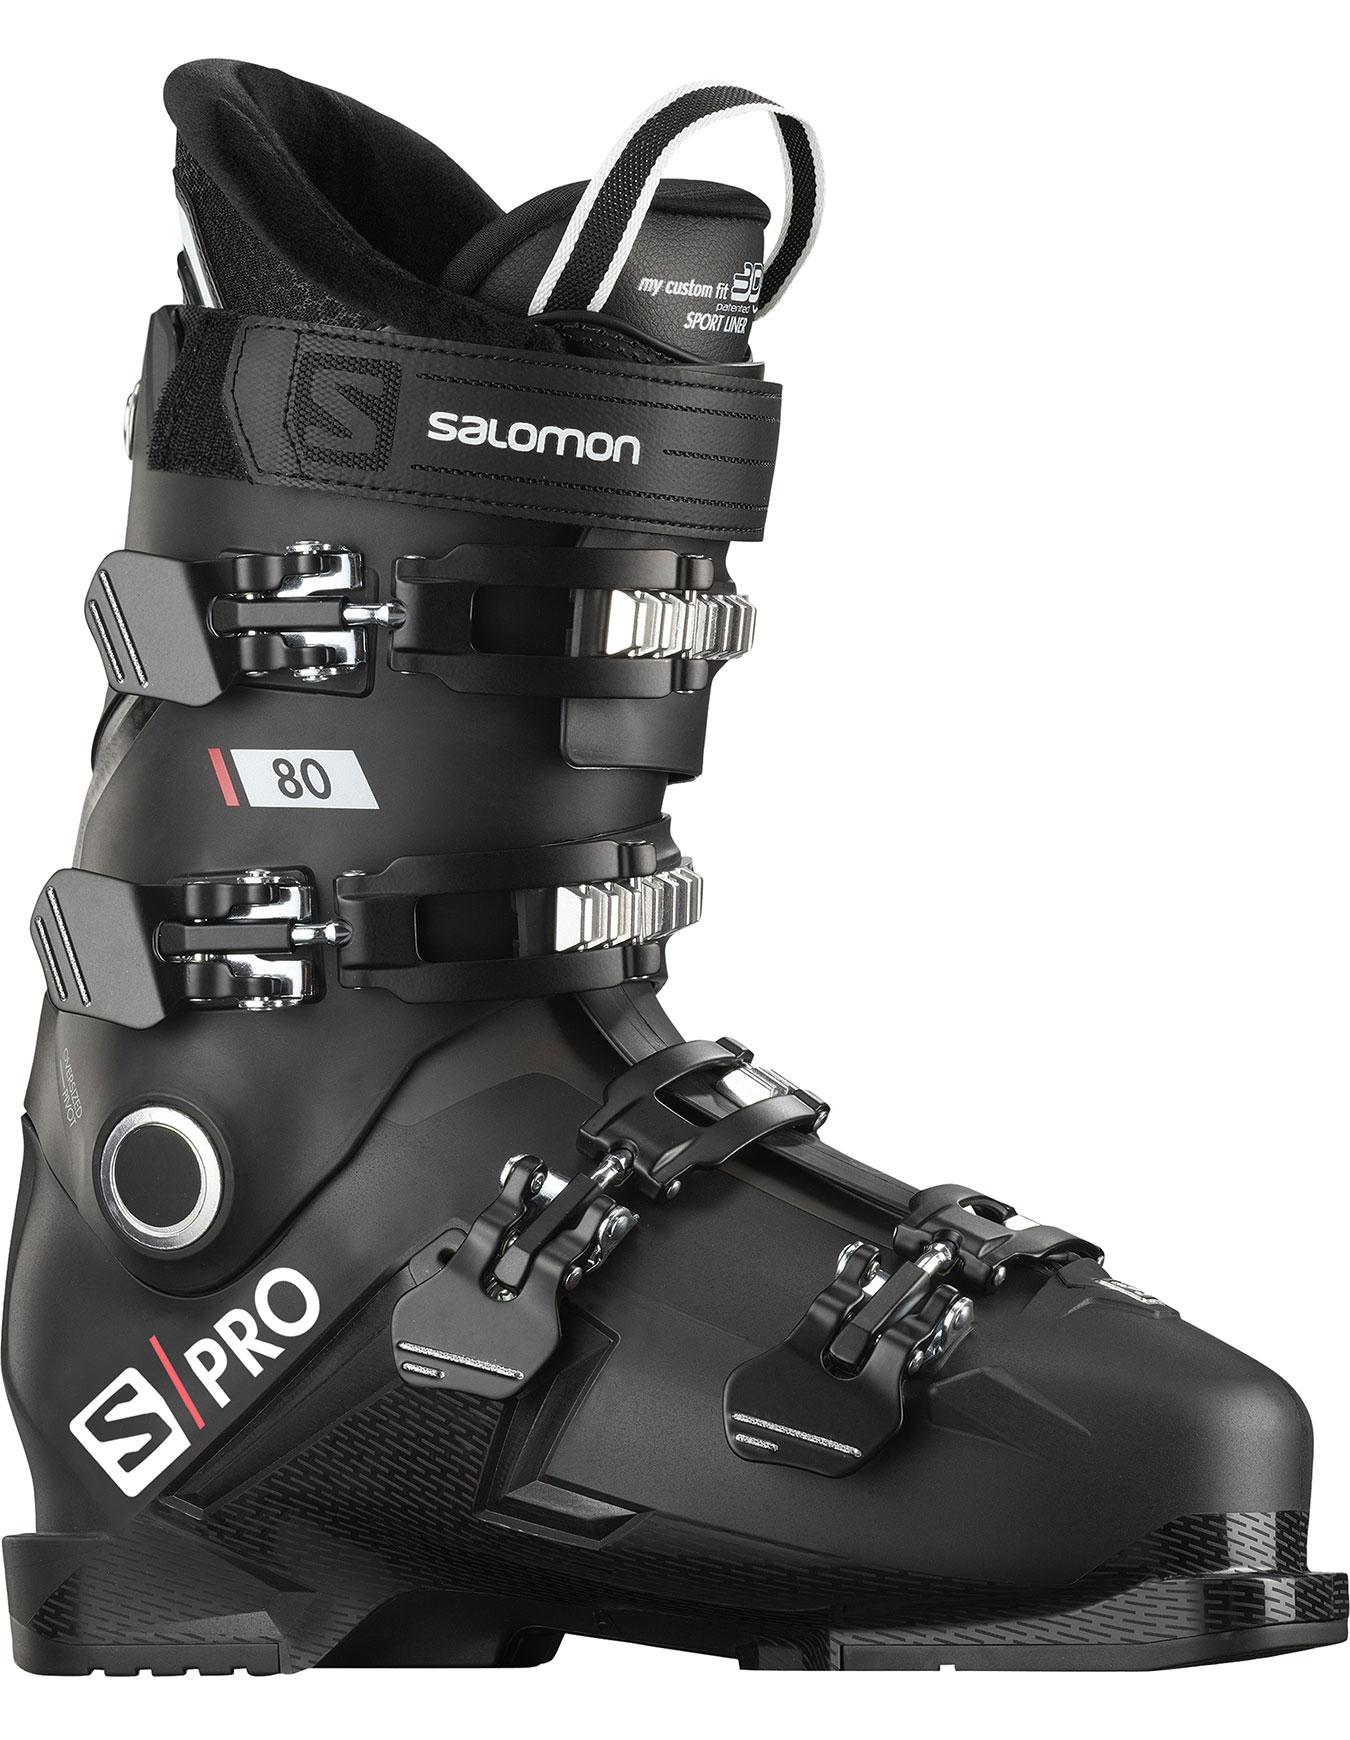 Chaussure de ski Salomon QST Pro 100 Black Anthracite Acide